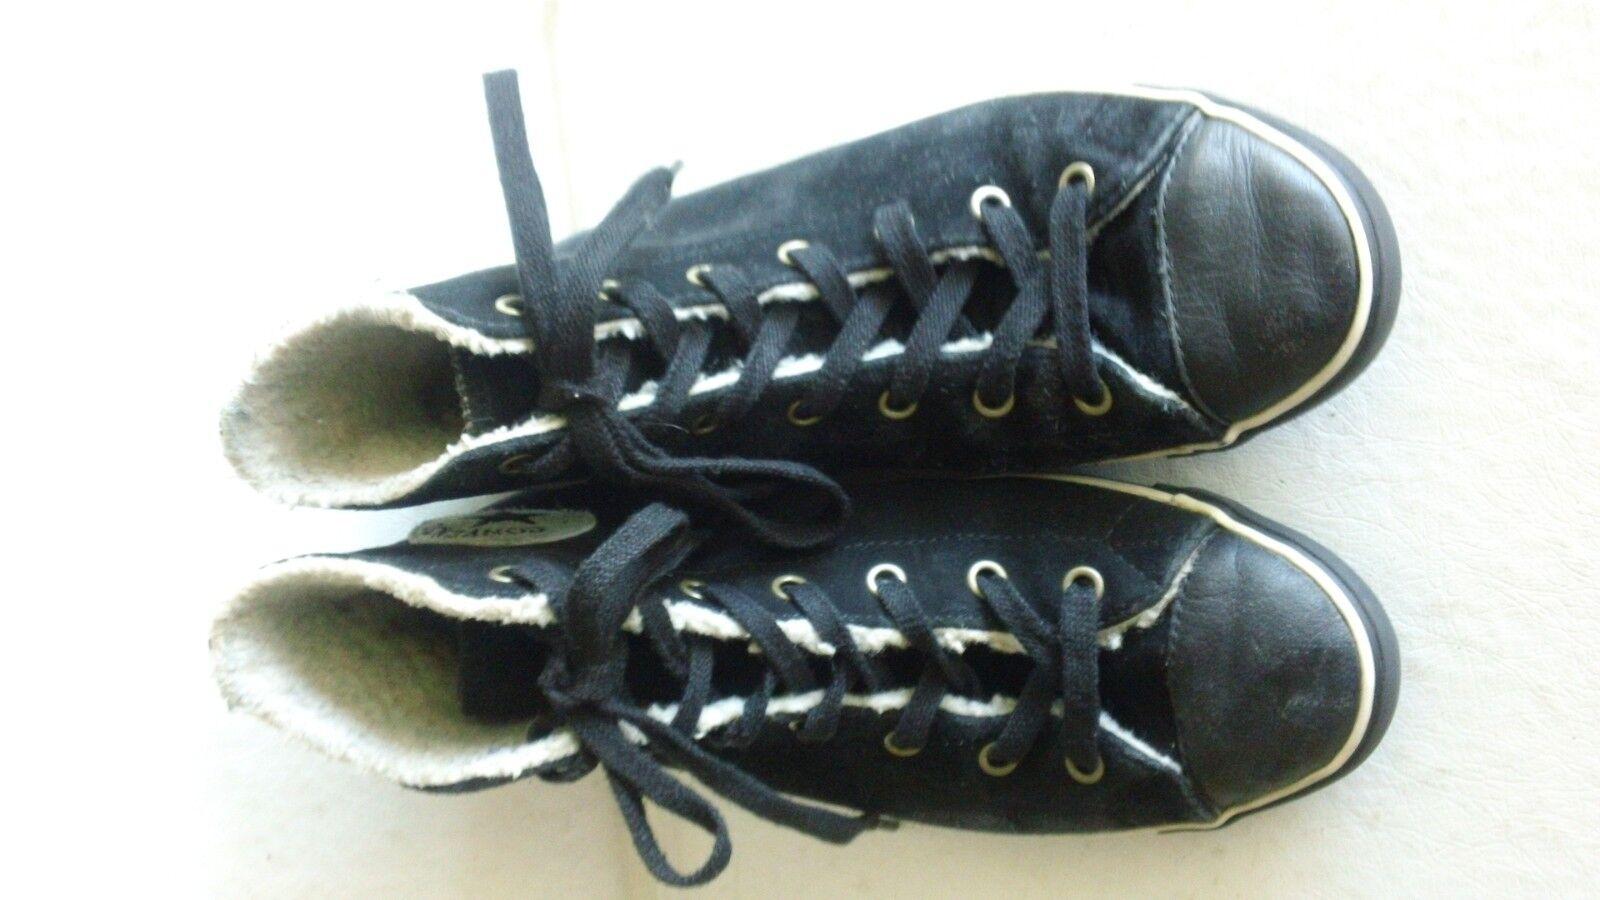 Señoras negras de de de ante Chuck Taylor All Star Converse Forrado High Top zapatillas 7.5  ahorra 50% -75% de descuento